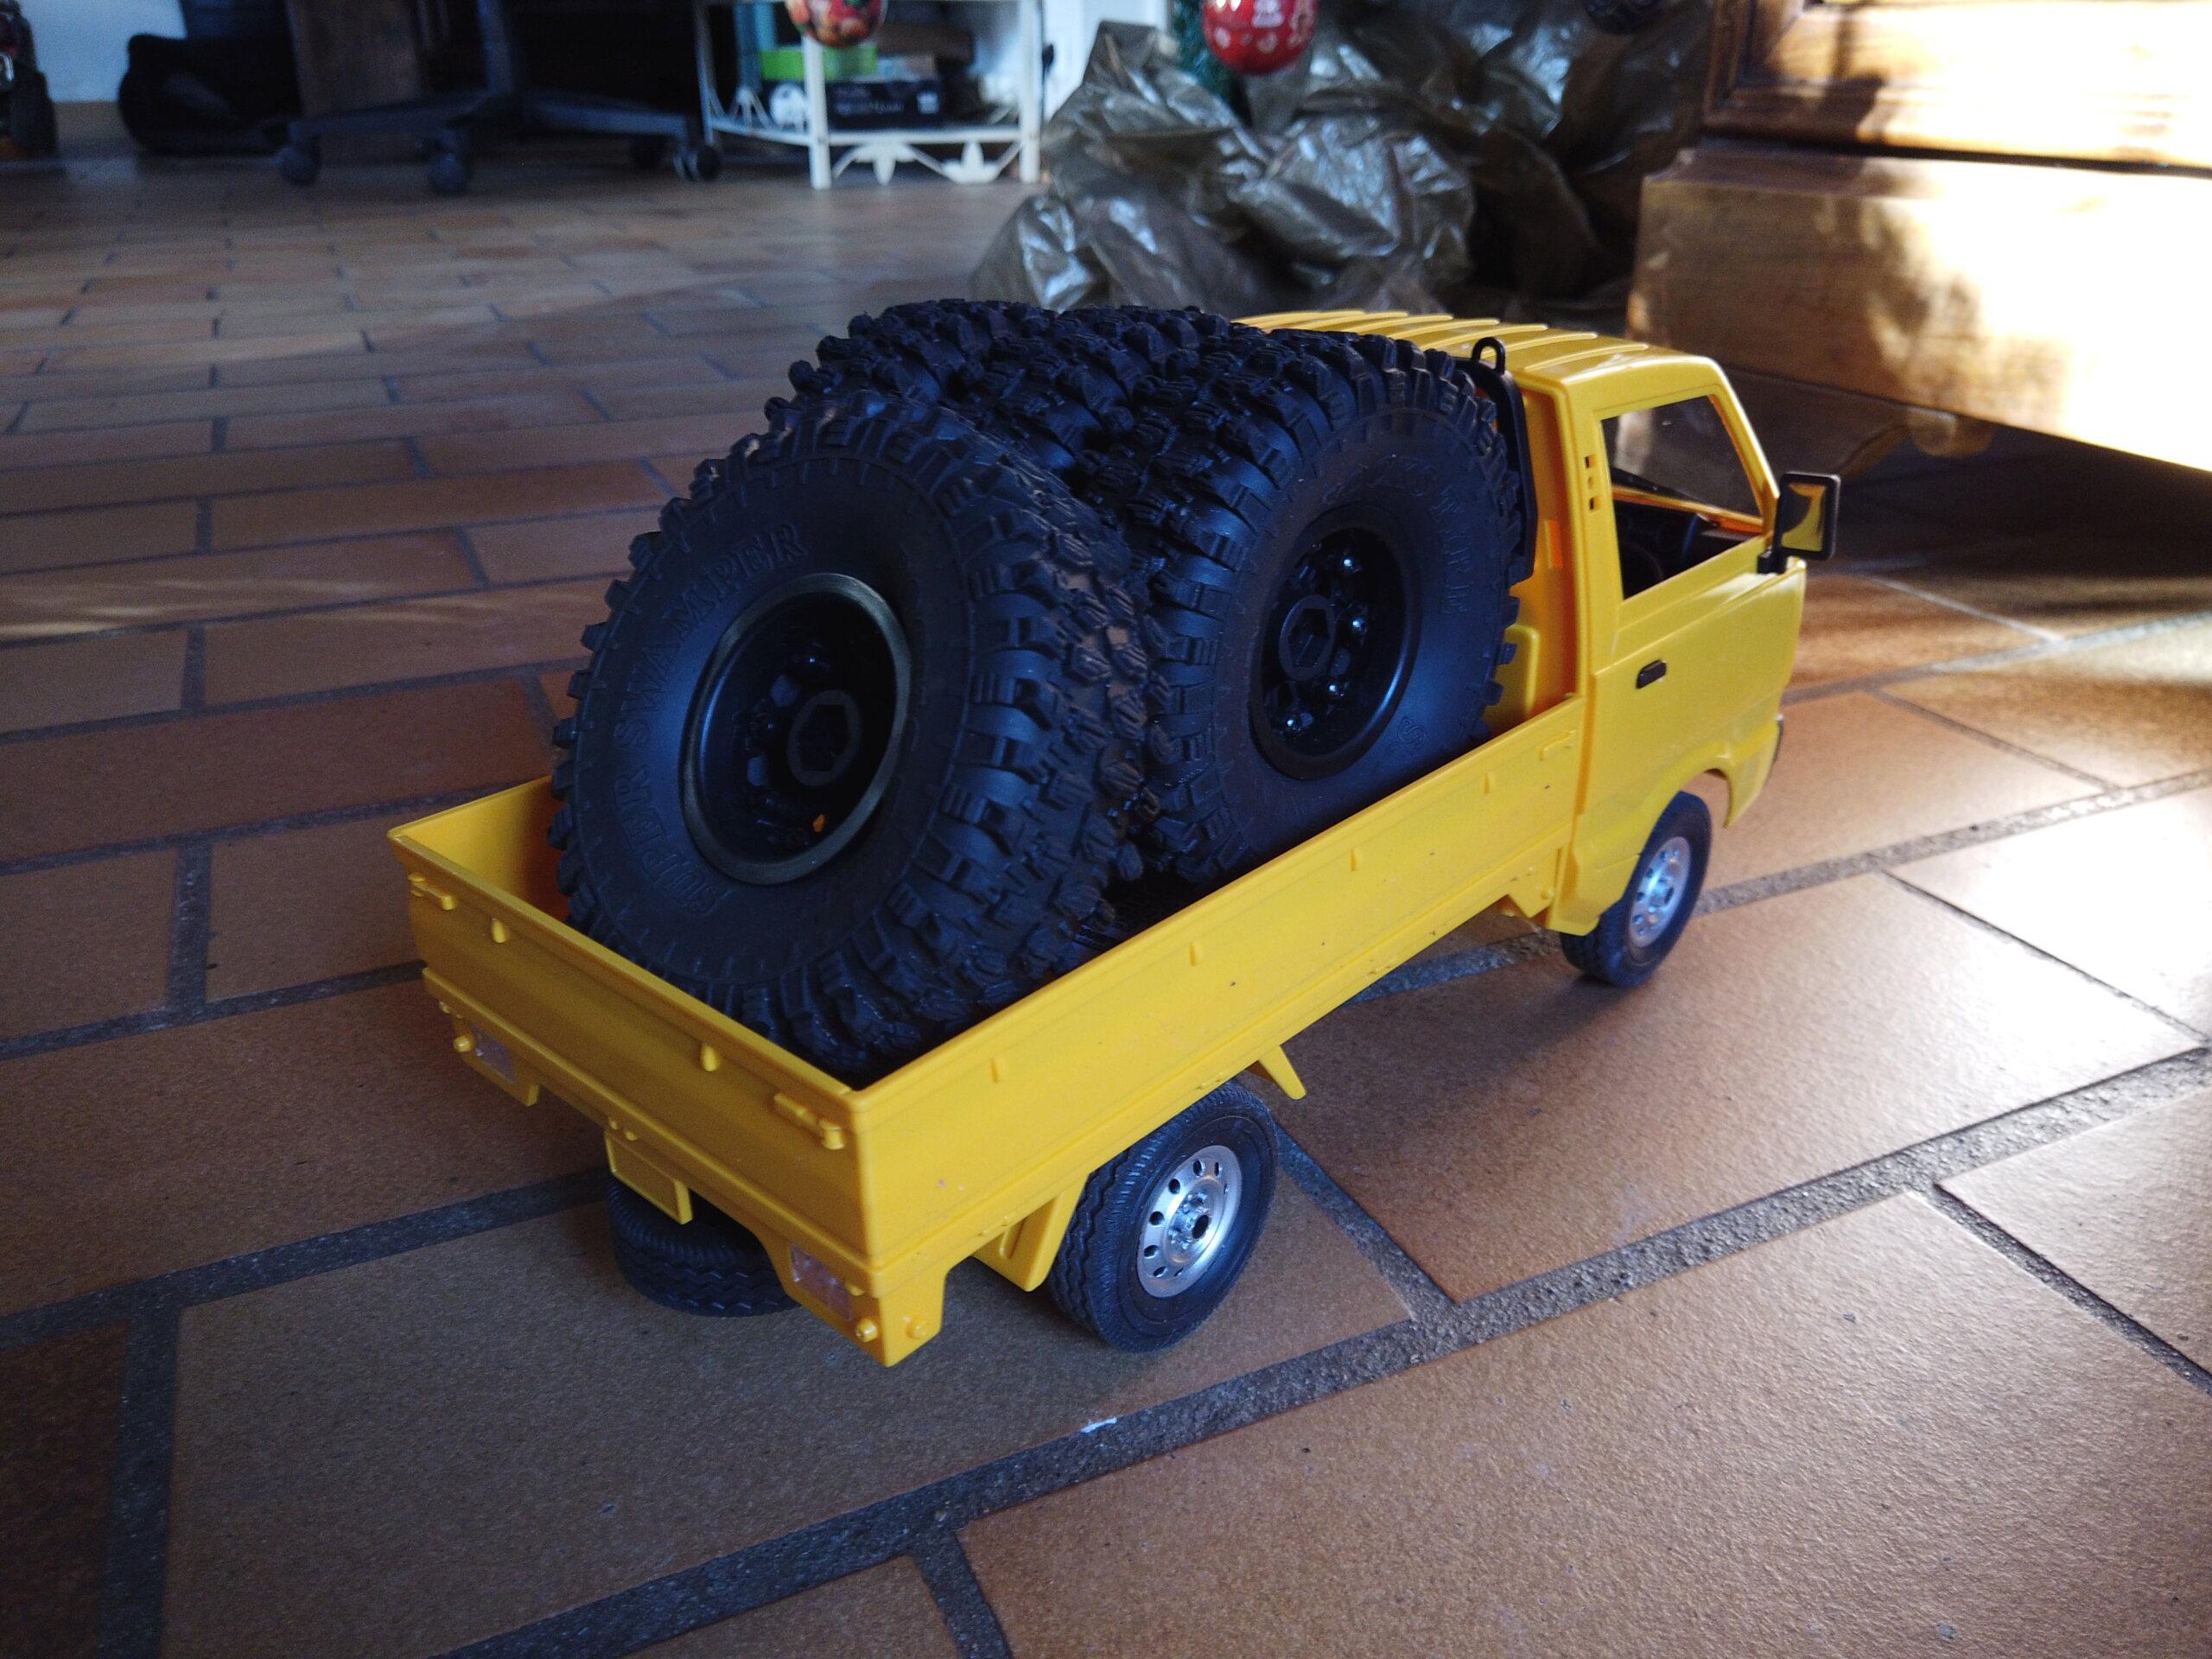 Un énorme camion de plus, le WPL D12 Suzuki Carry 1/10... Dji_0113